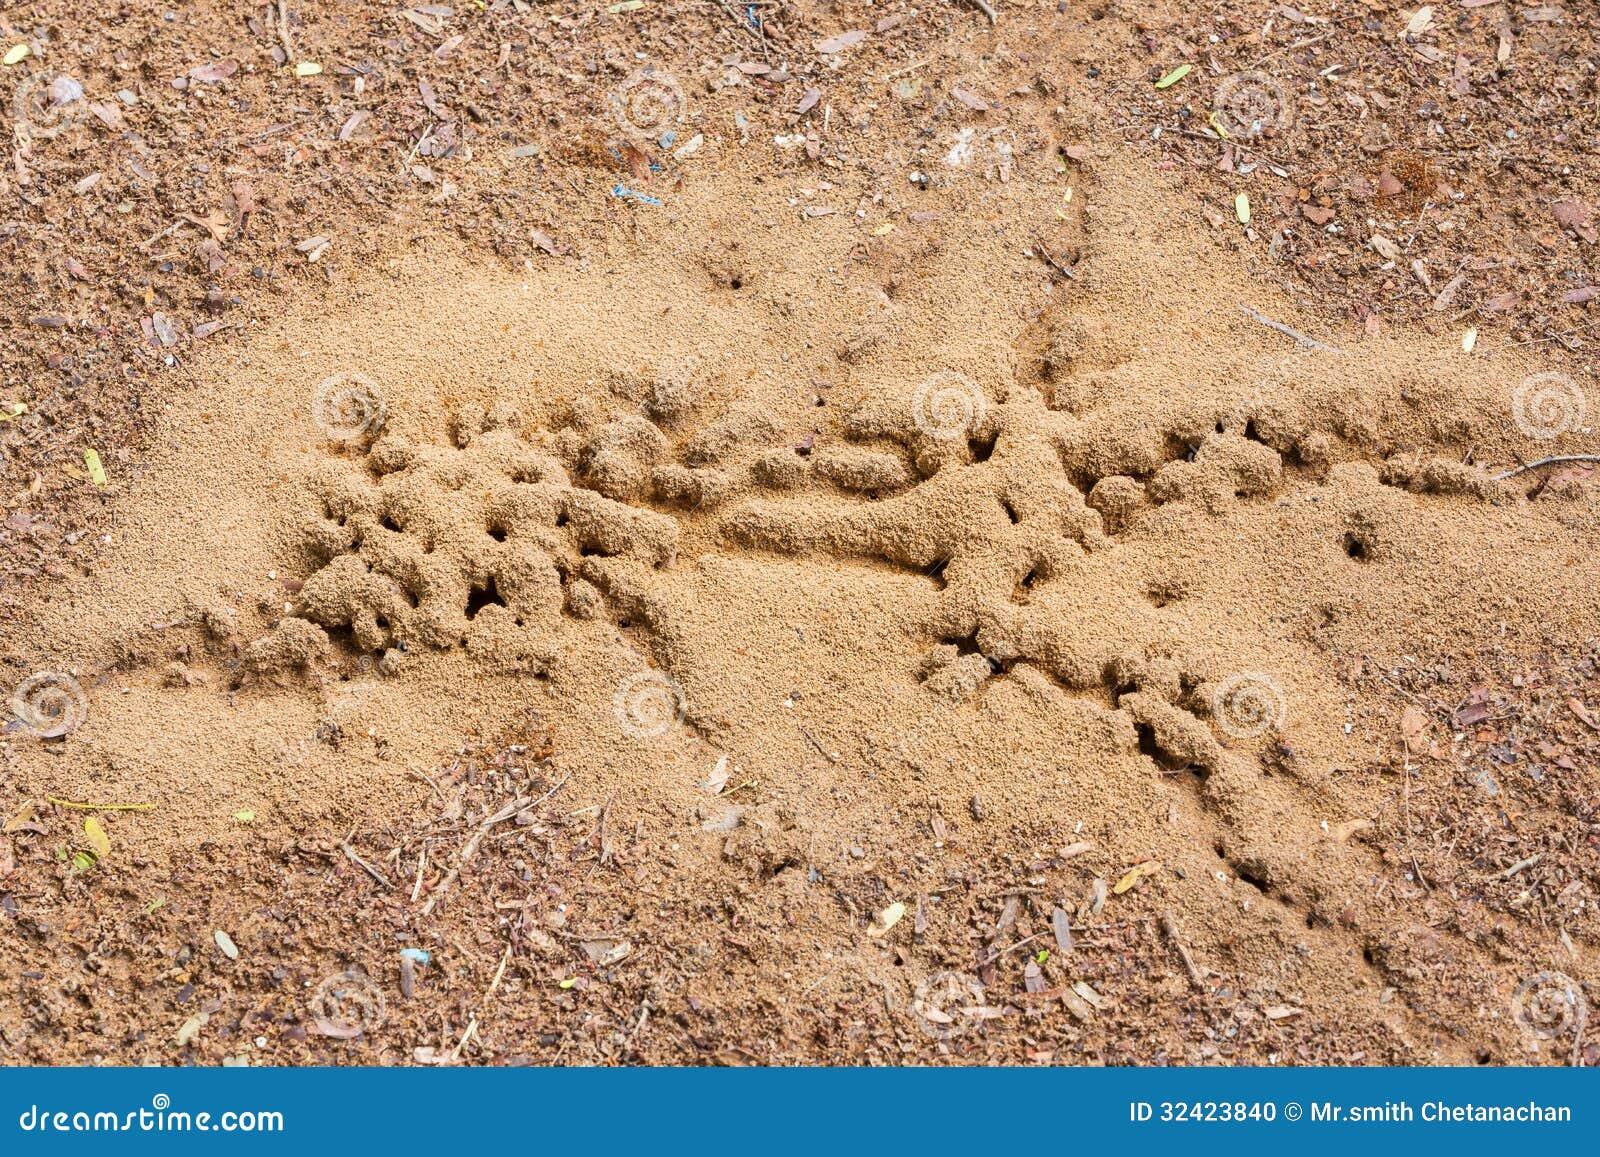 mierennest stock foto afbeelding bestaande uit zand. Black Bedroom Furniture Sets. Home Design Ideas